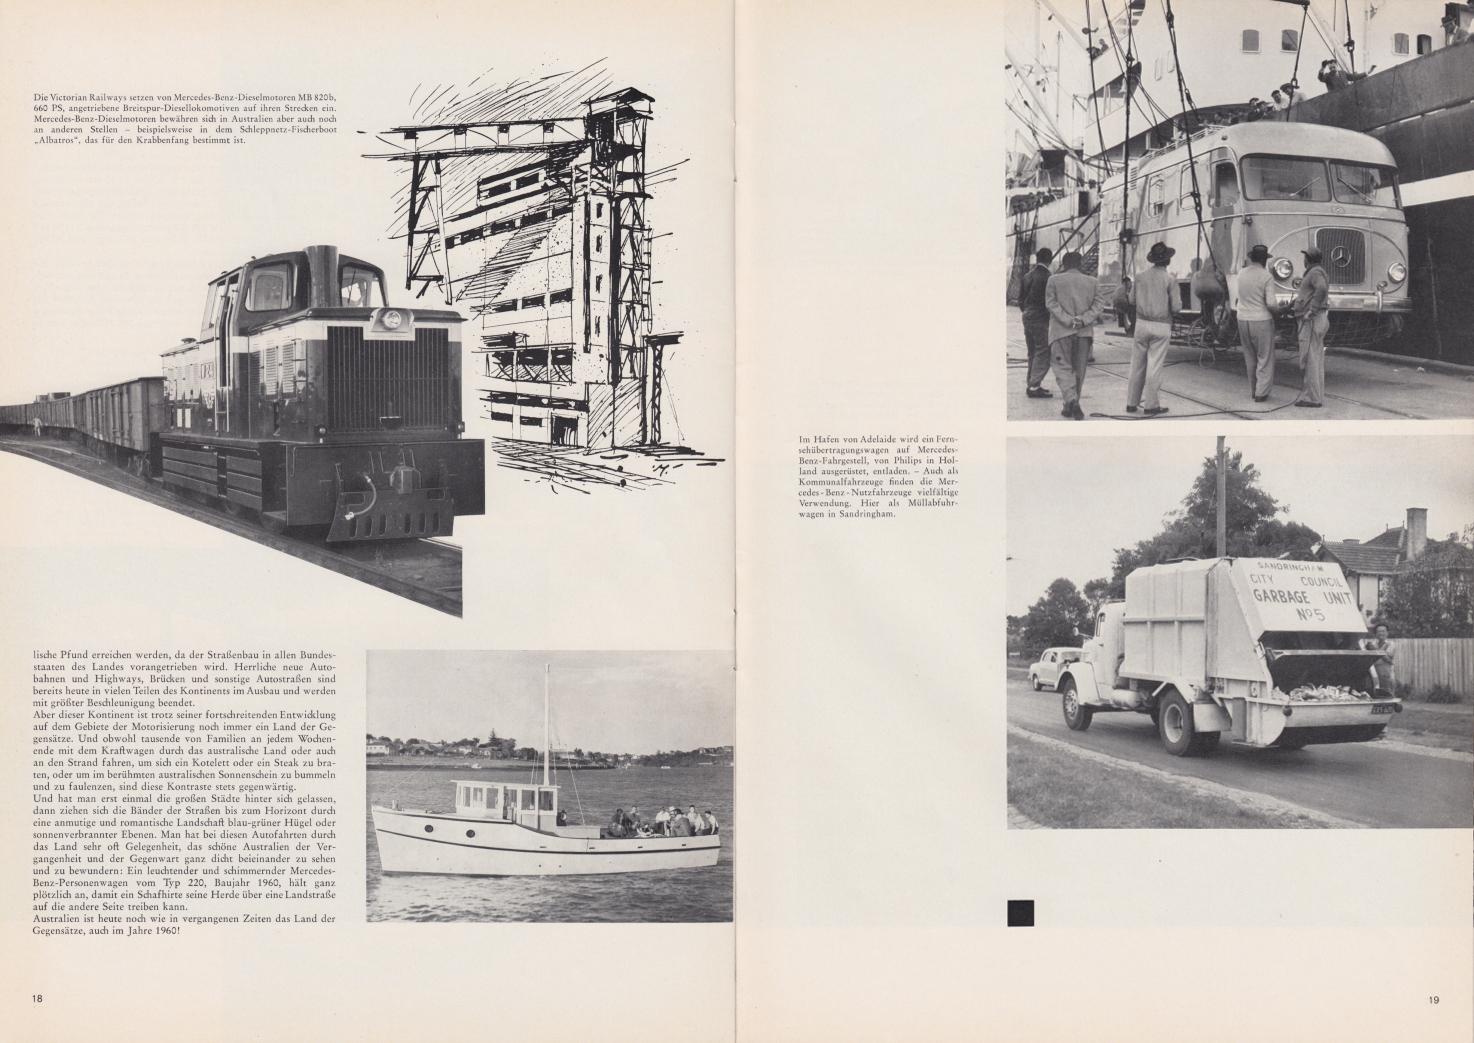 (REVISTA): Periódico In aller welt n.º 44 - Mercedes-Benz no mundo - 1960 - multilingue 010